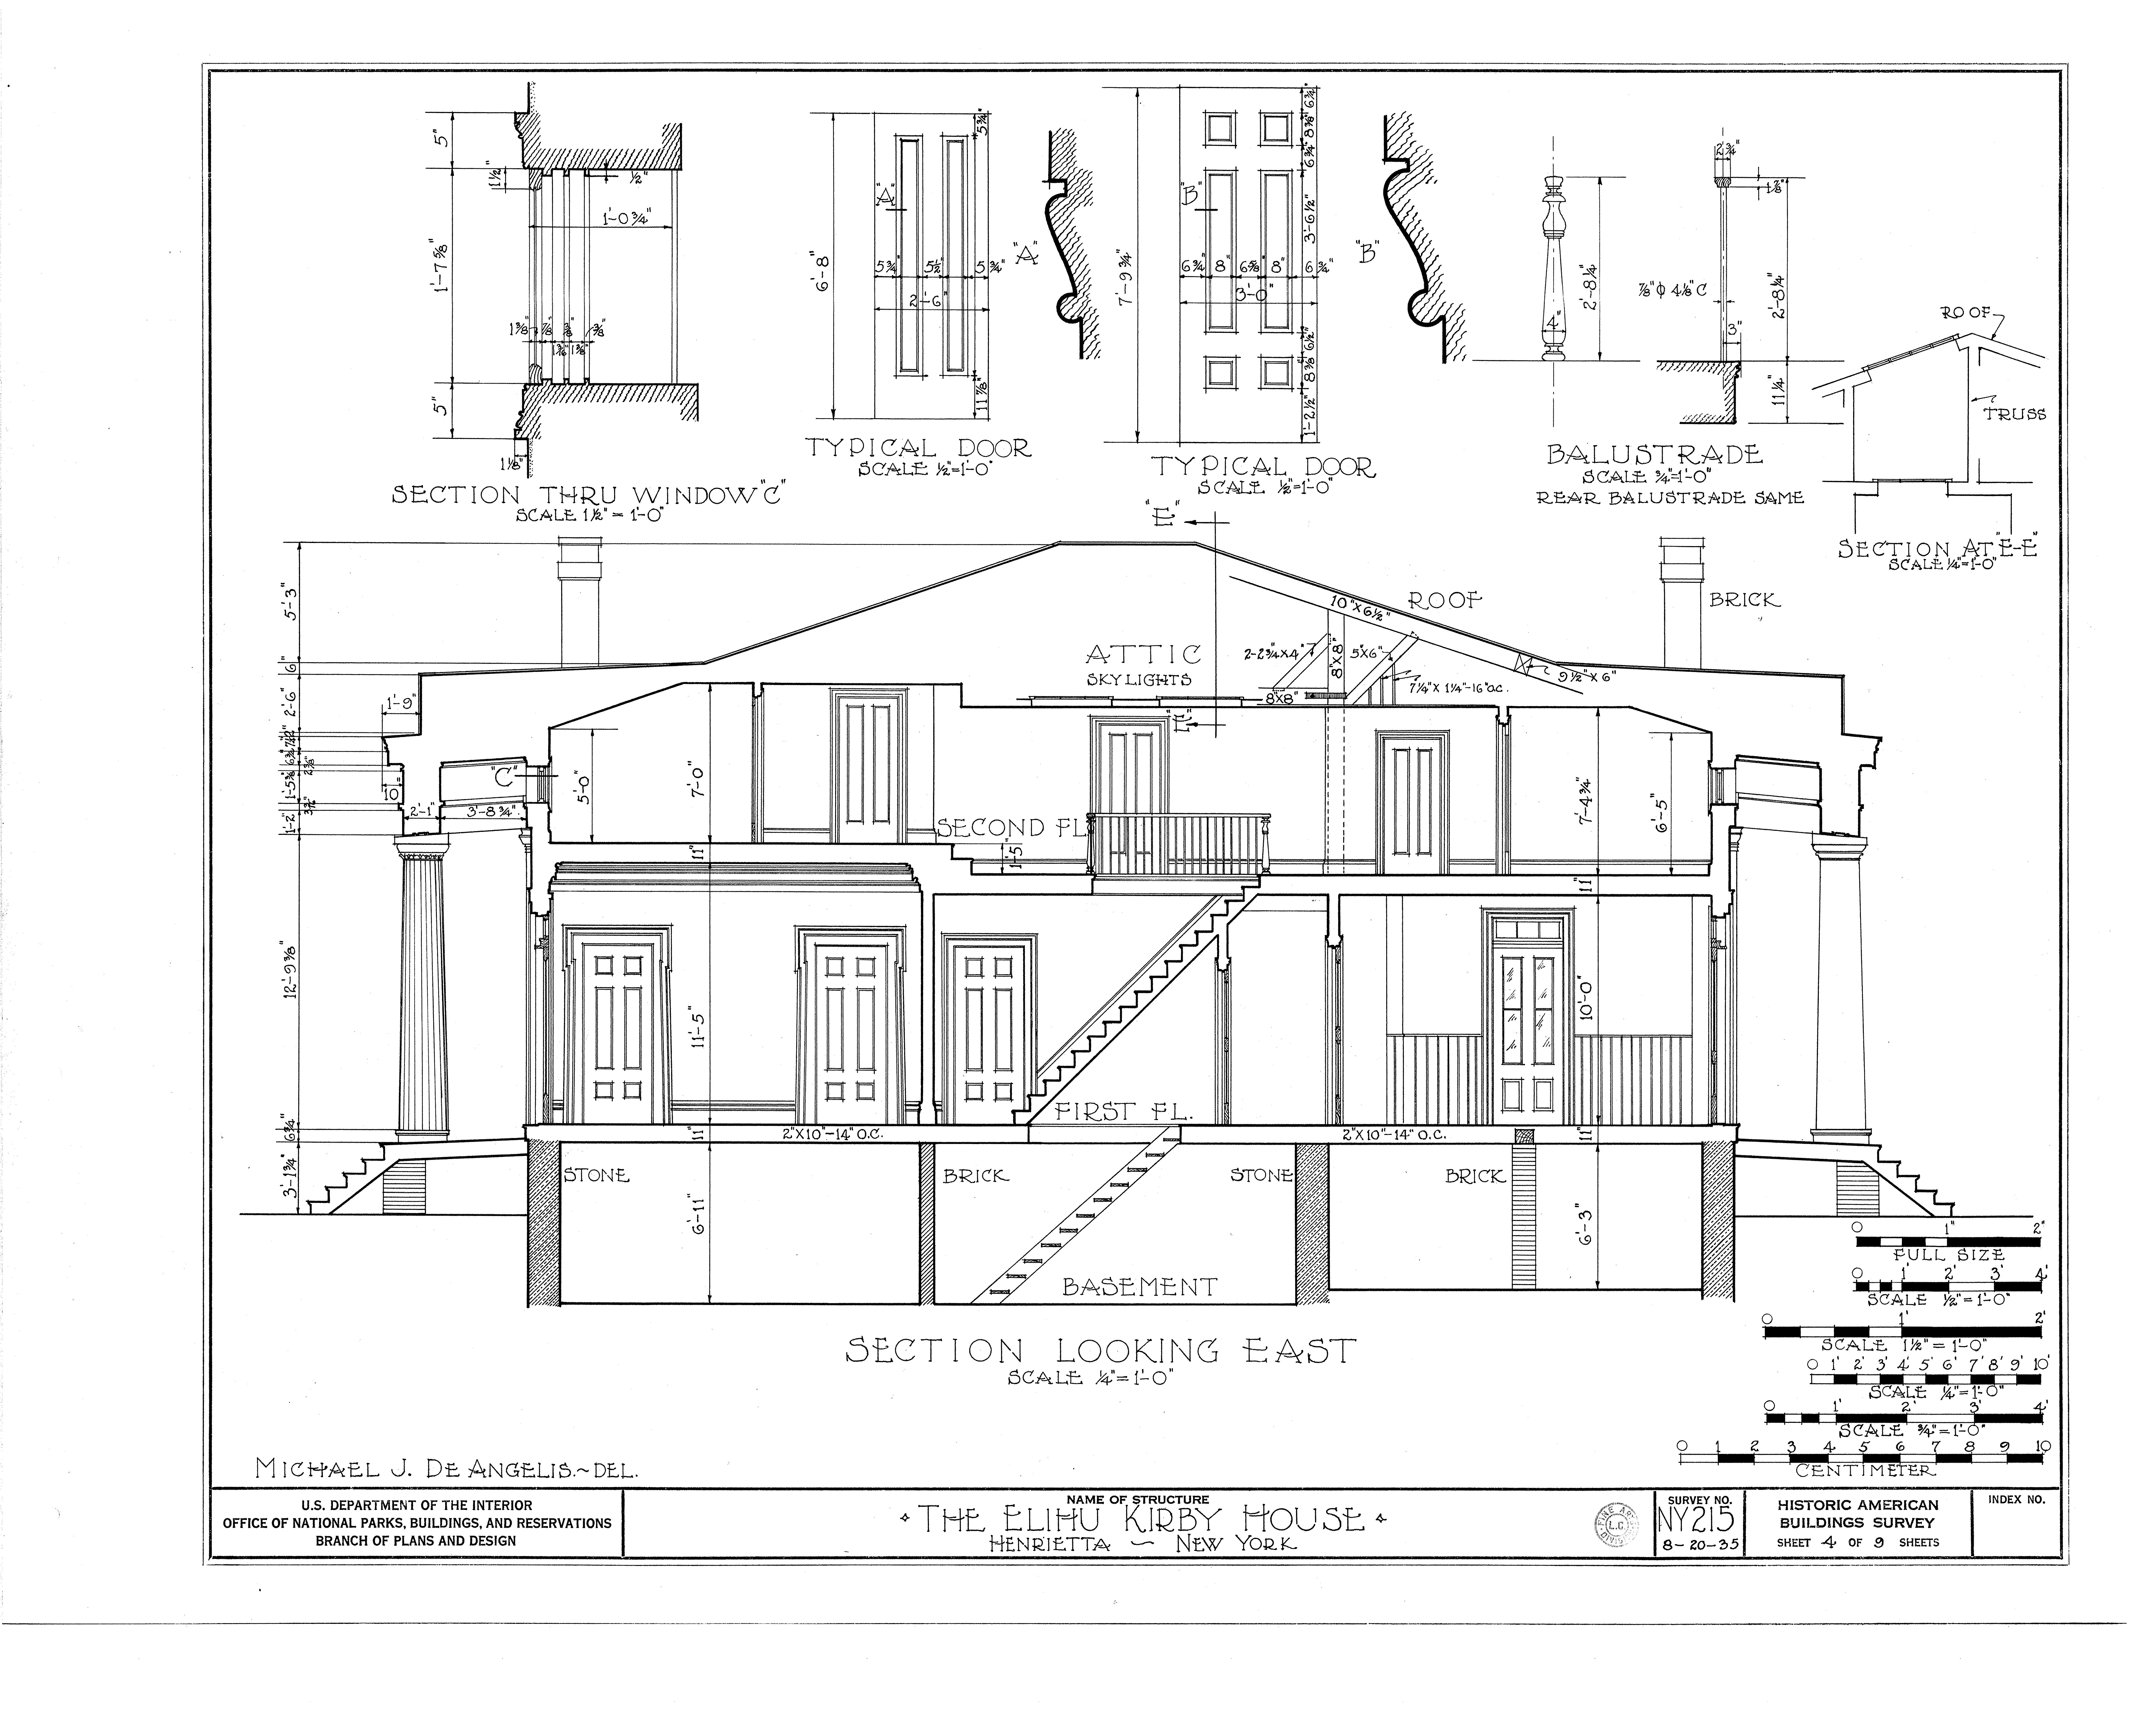 New york monroe county henrietta - File Elihu Kirby House East Henrietta And Lehigh Station Roads Henrietta Monroe